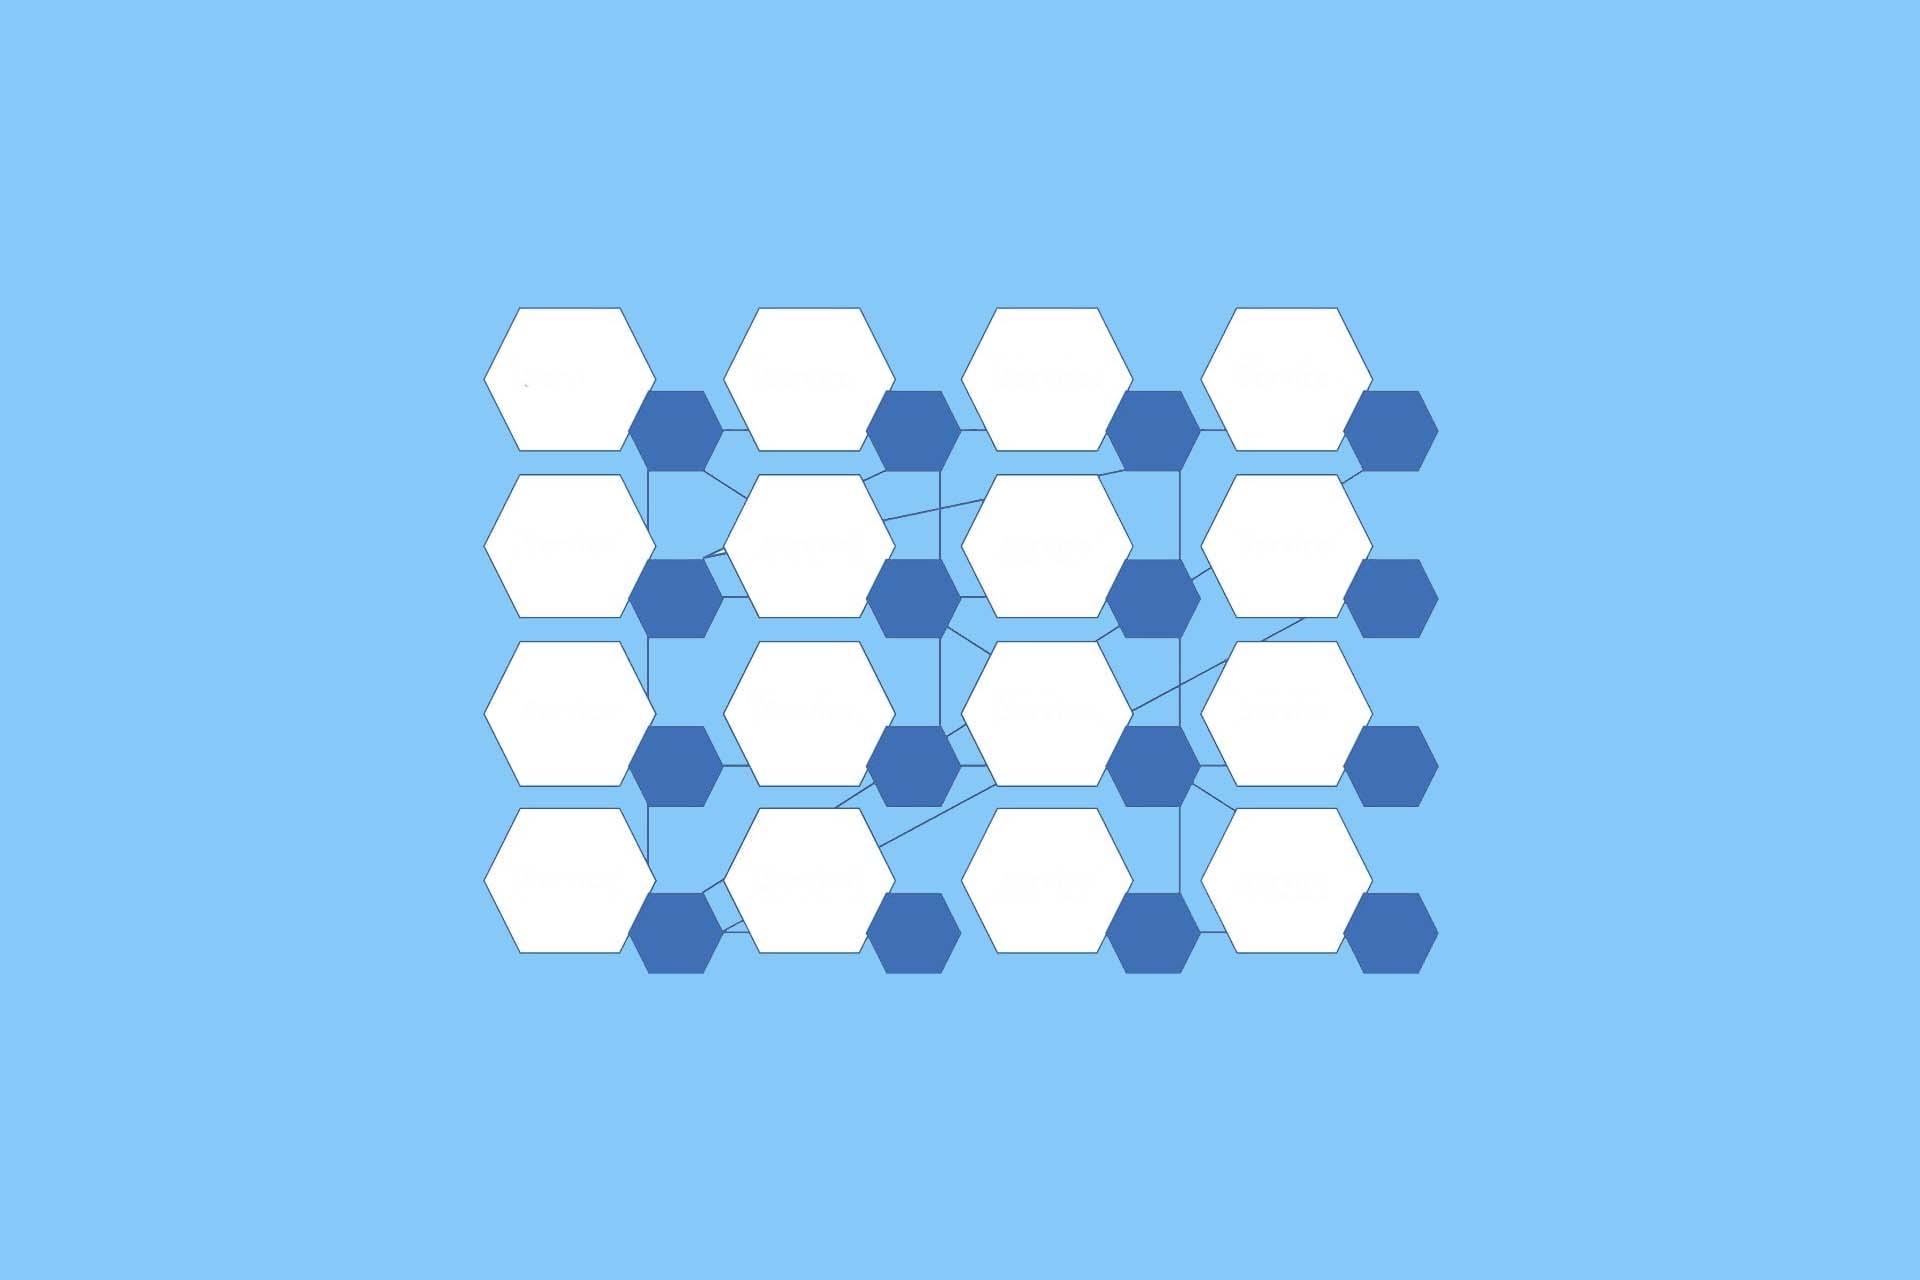 Cross-Cutting Concerns durch Muster lösen - Blog - t2informatik